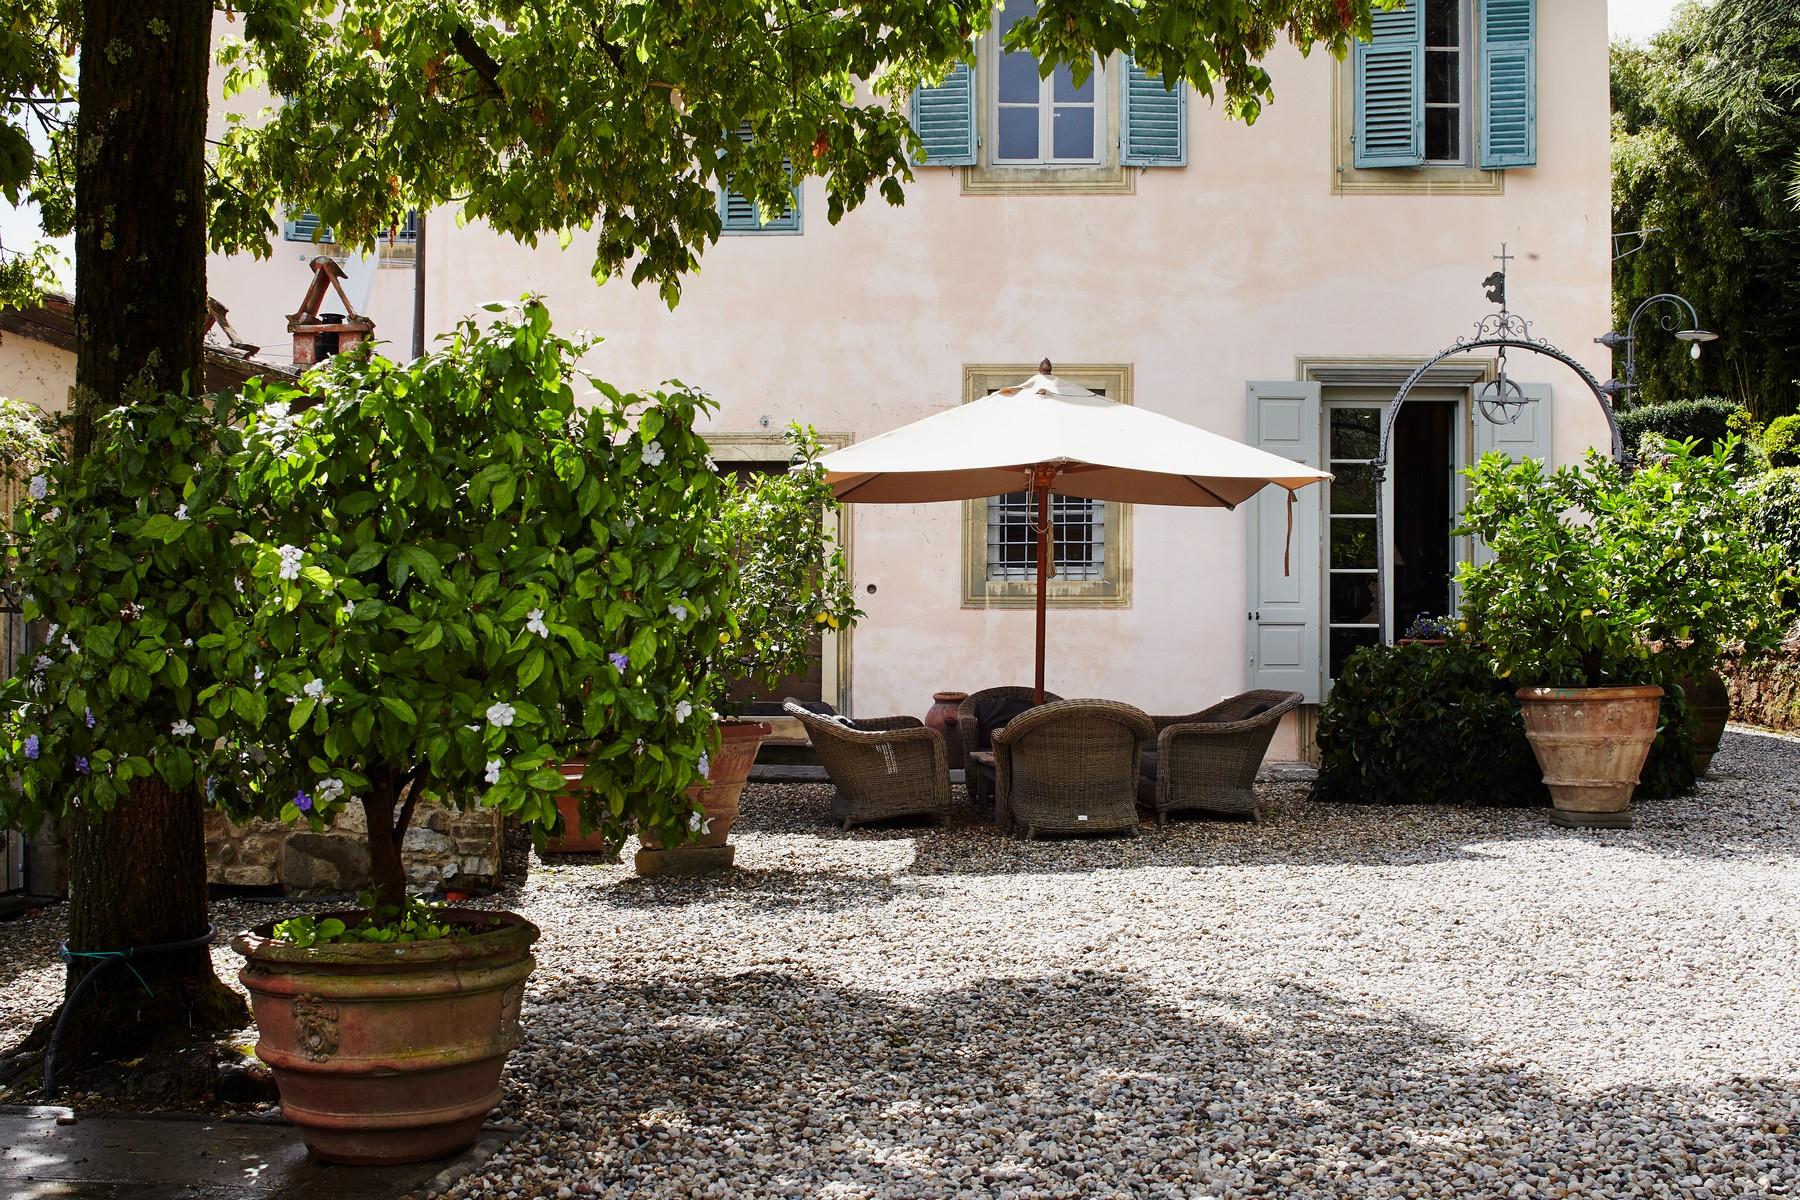 Villa in Vendita a Lucca: 5 locali, 2500 mq - Foto 24